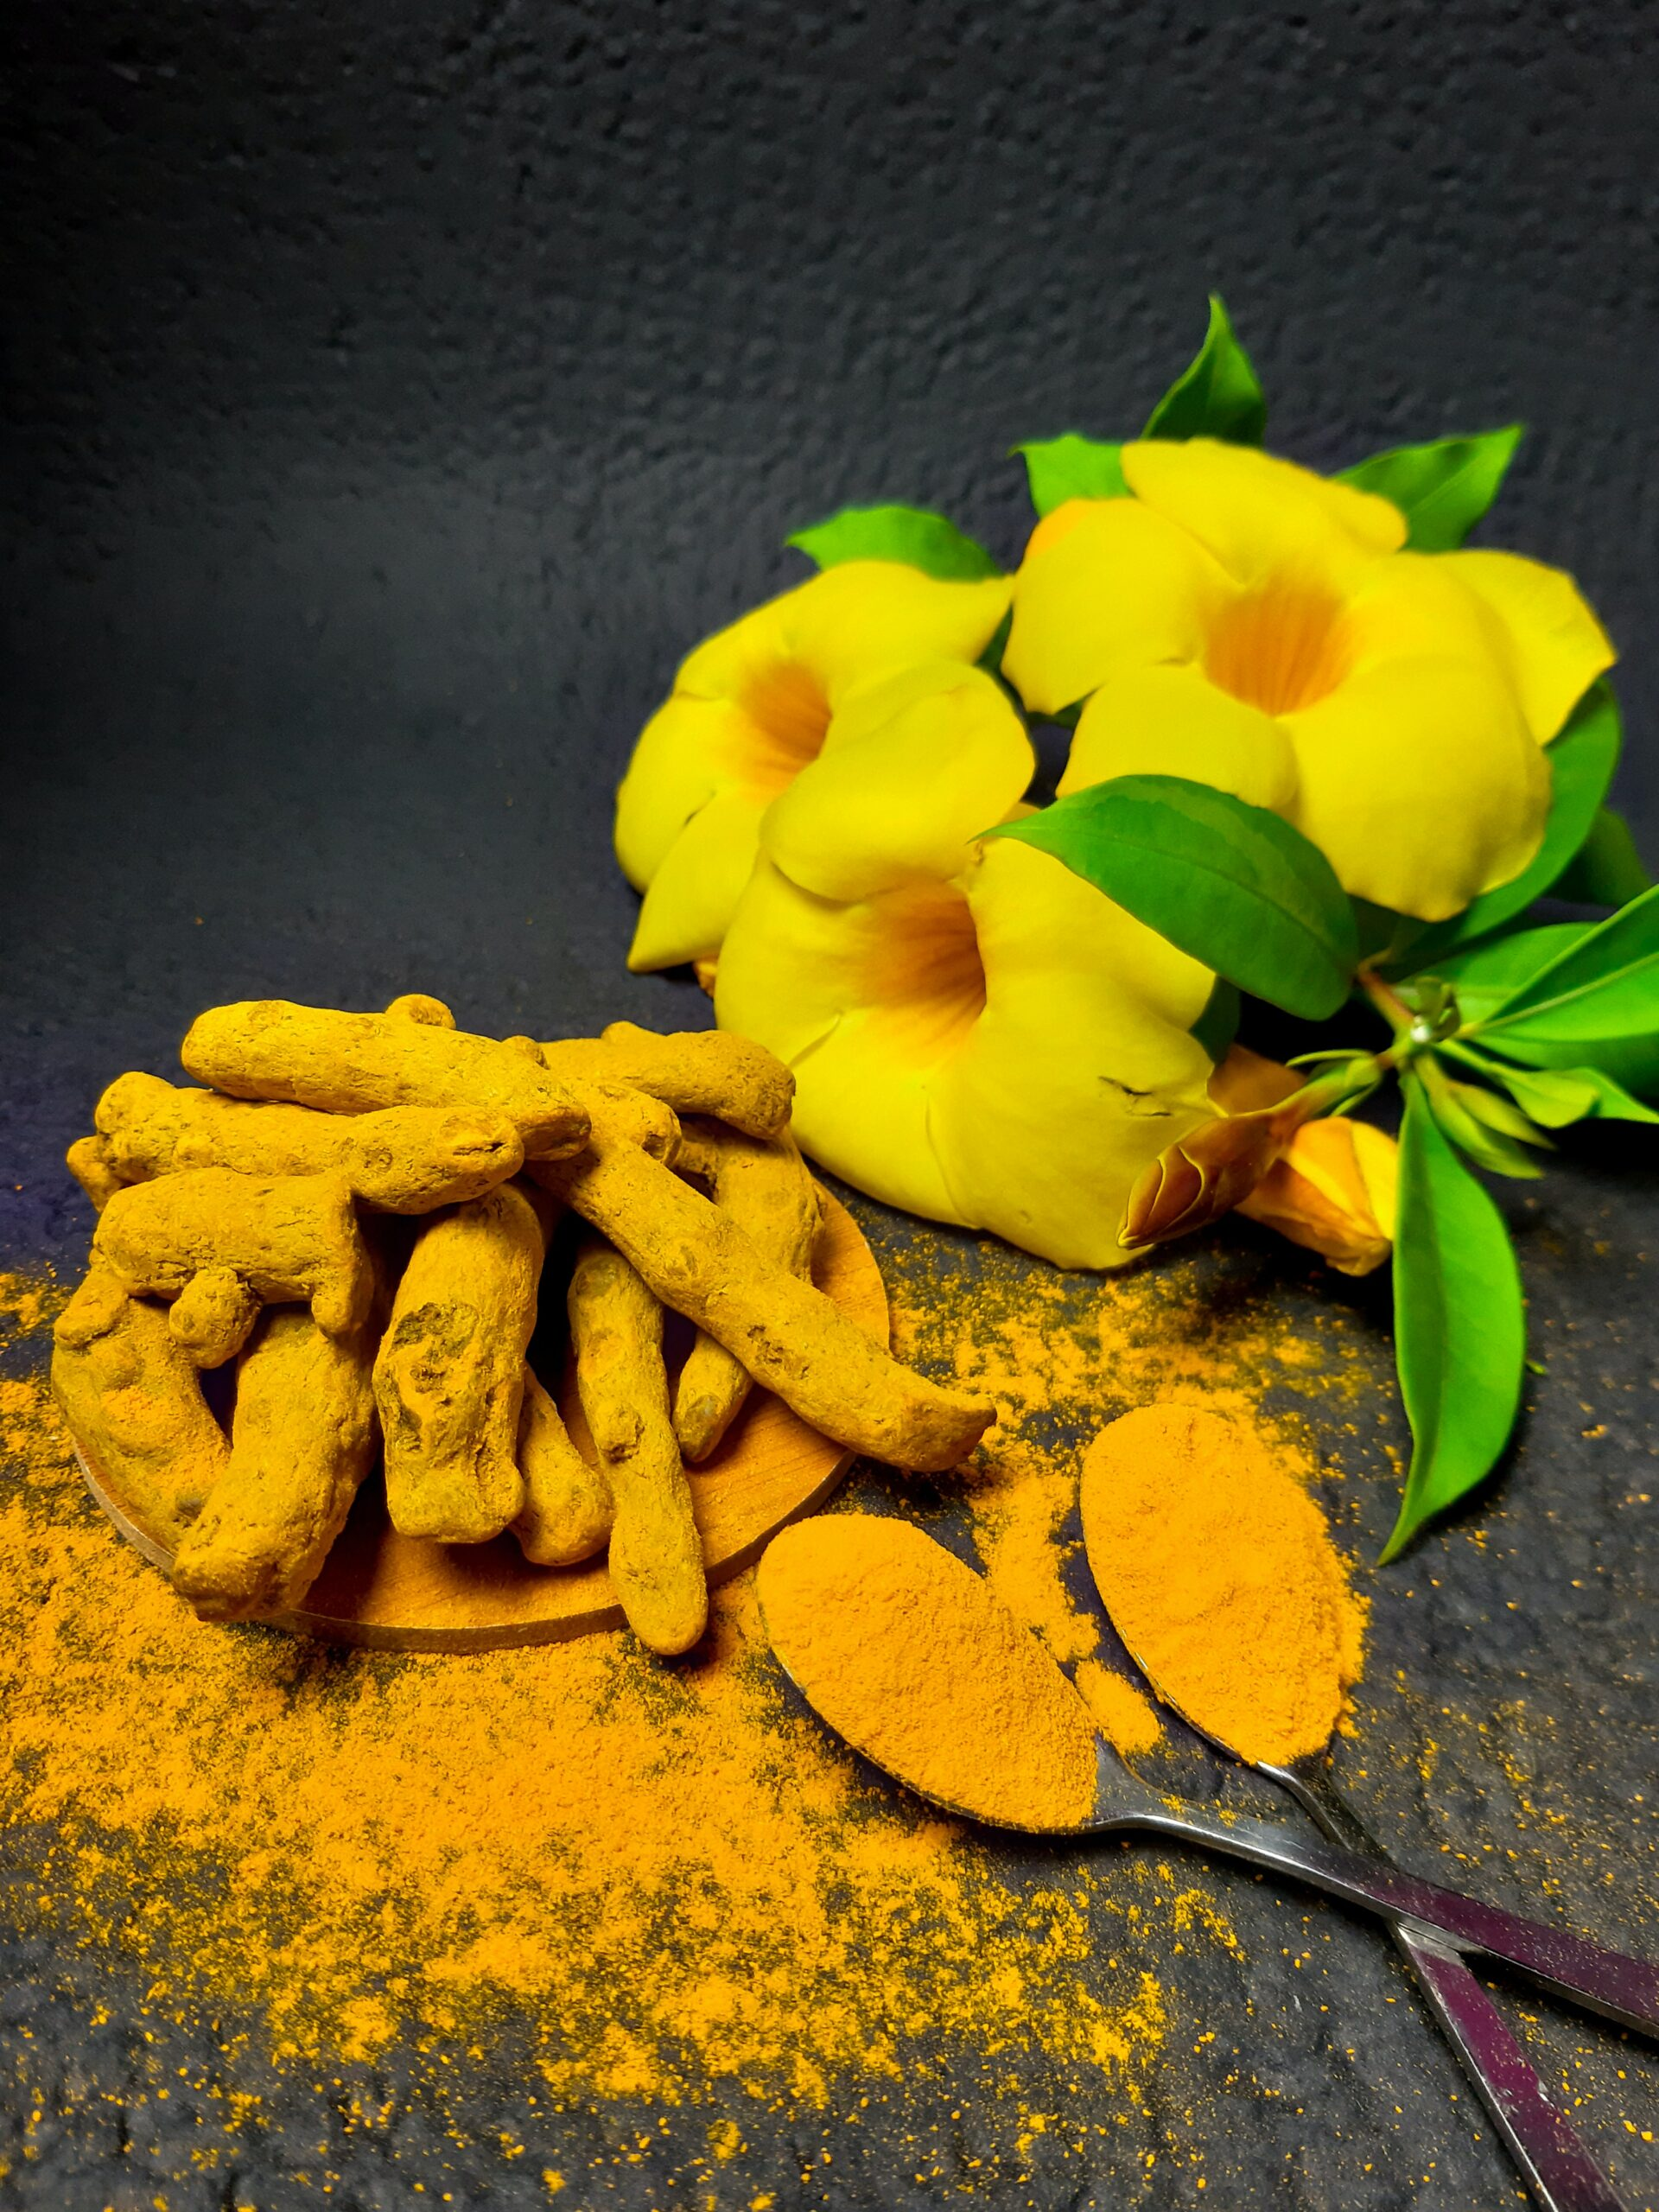 Turmeric and Ginger: Anti-Inflammatory Magic